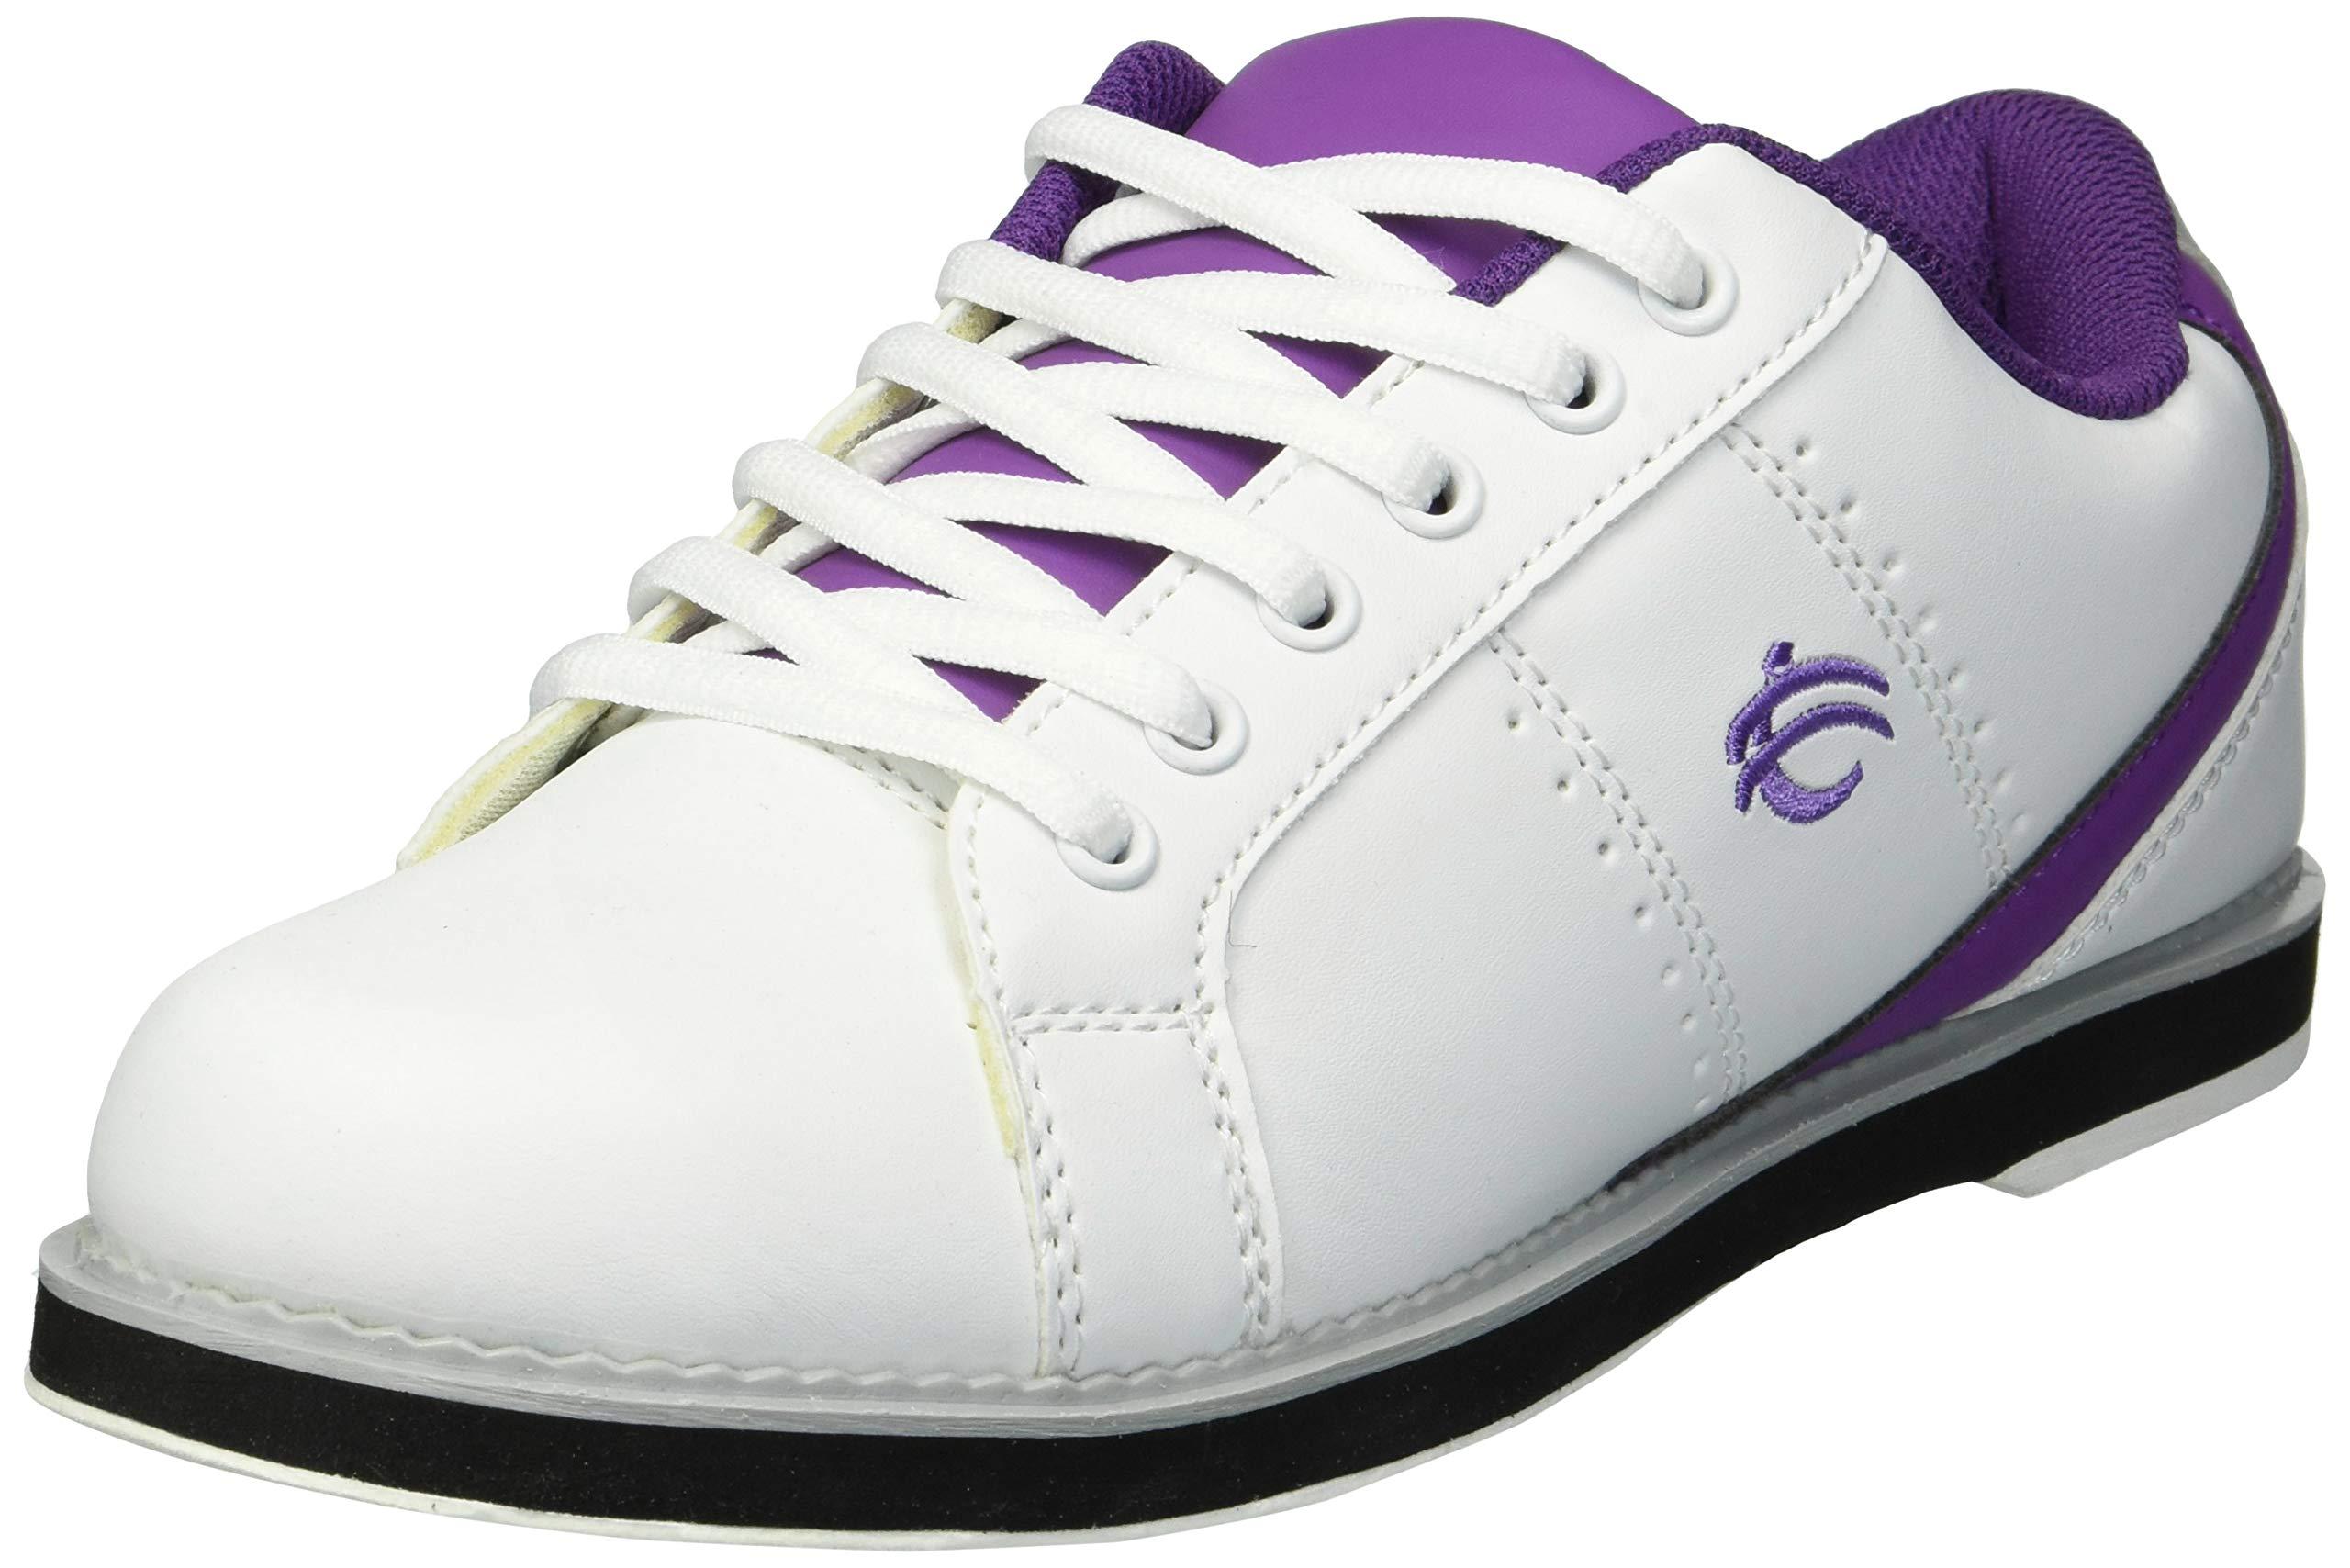 BSI Women's 460 Bowling Shoe, White/Purple, Size 7 by BSI (Image #1)